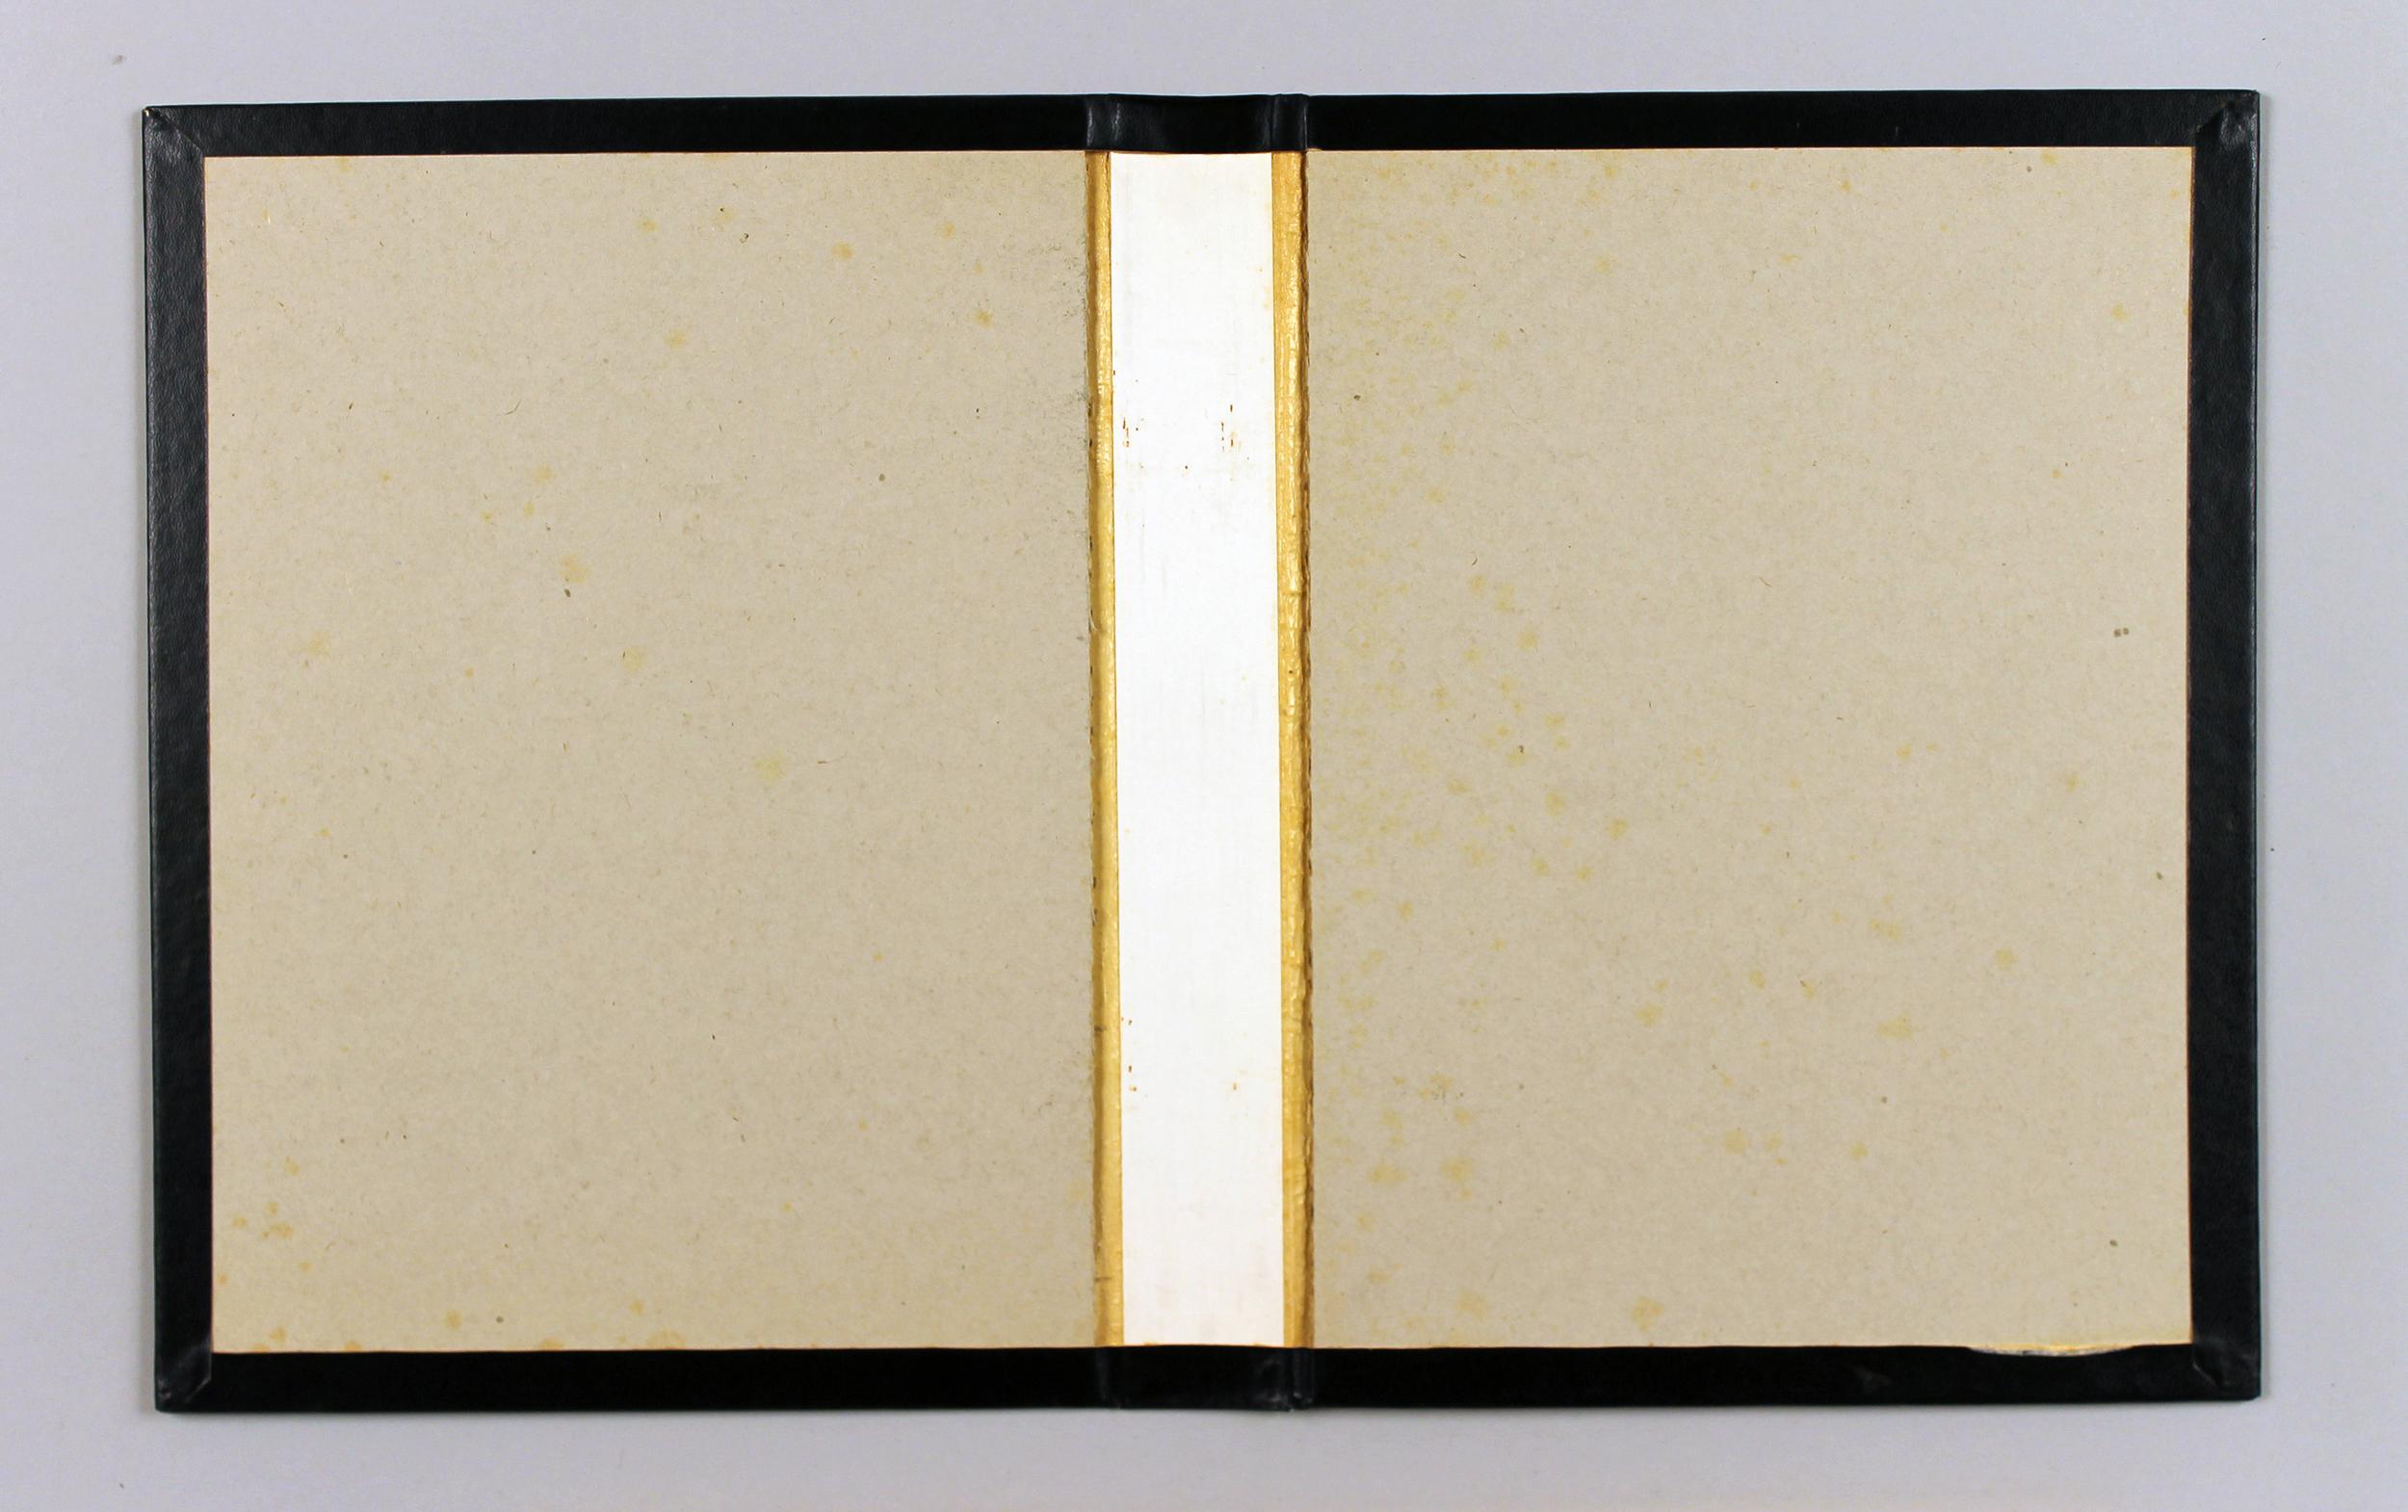 "Volume One (White Line)  Found object, wood, 12"" x 20.25"", 2013"